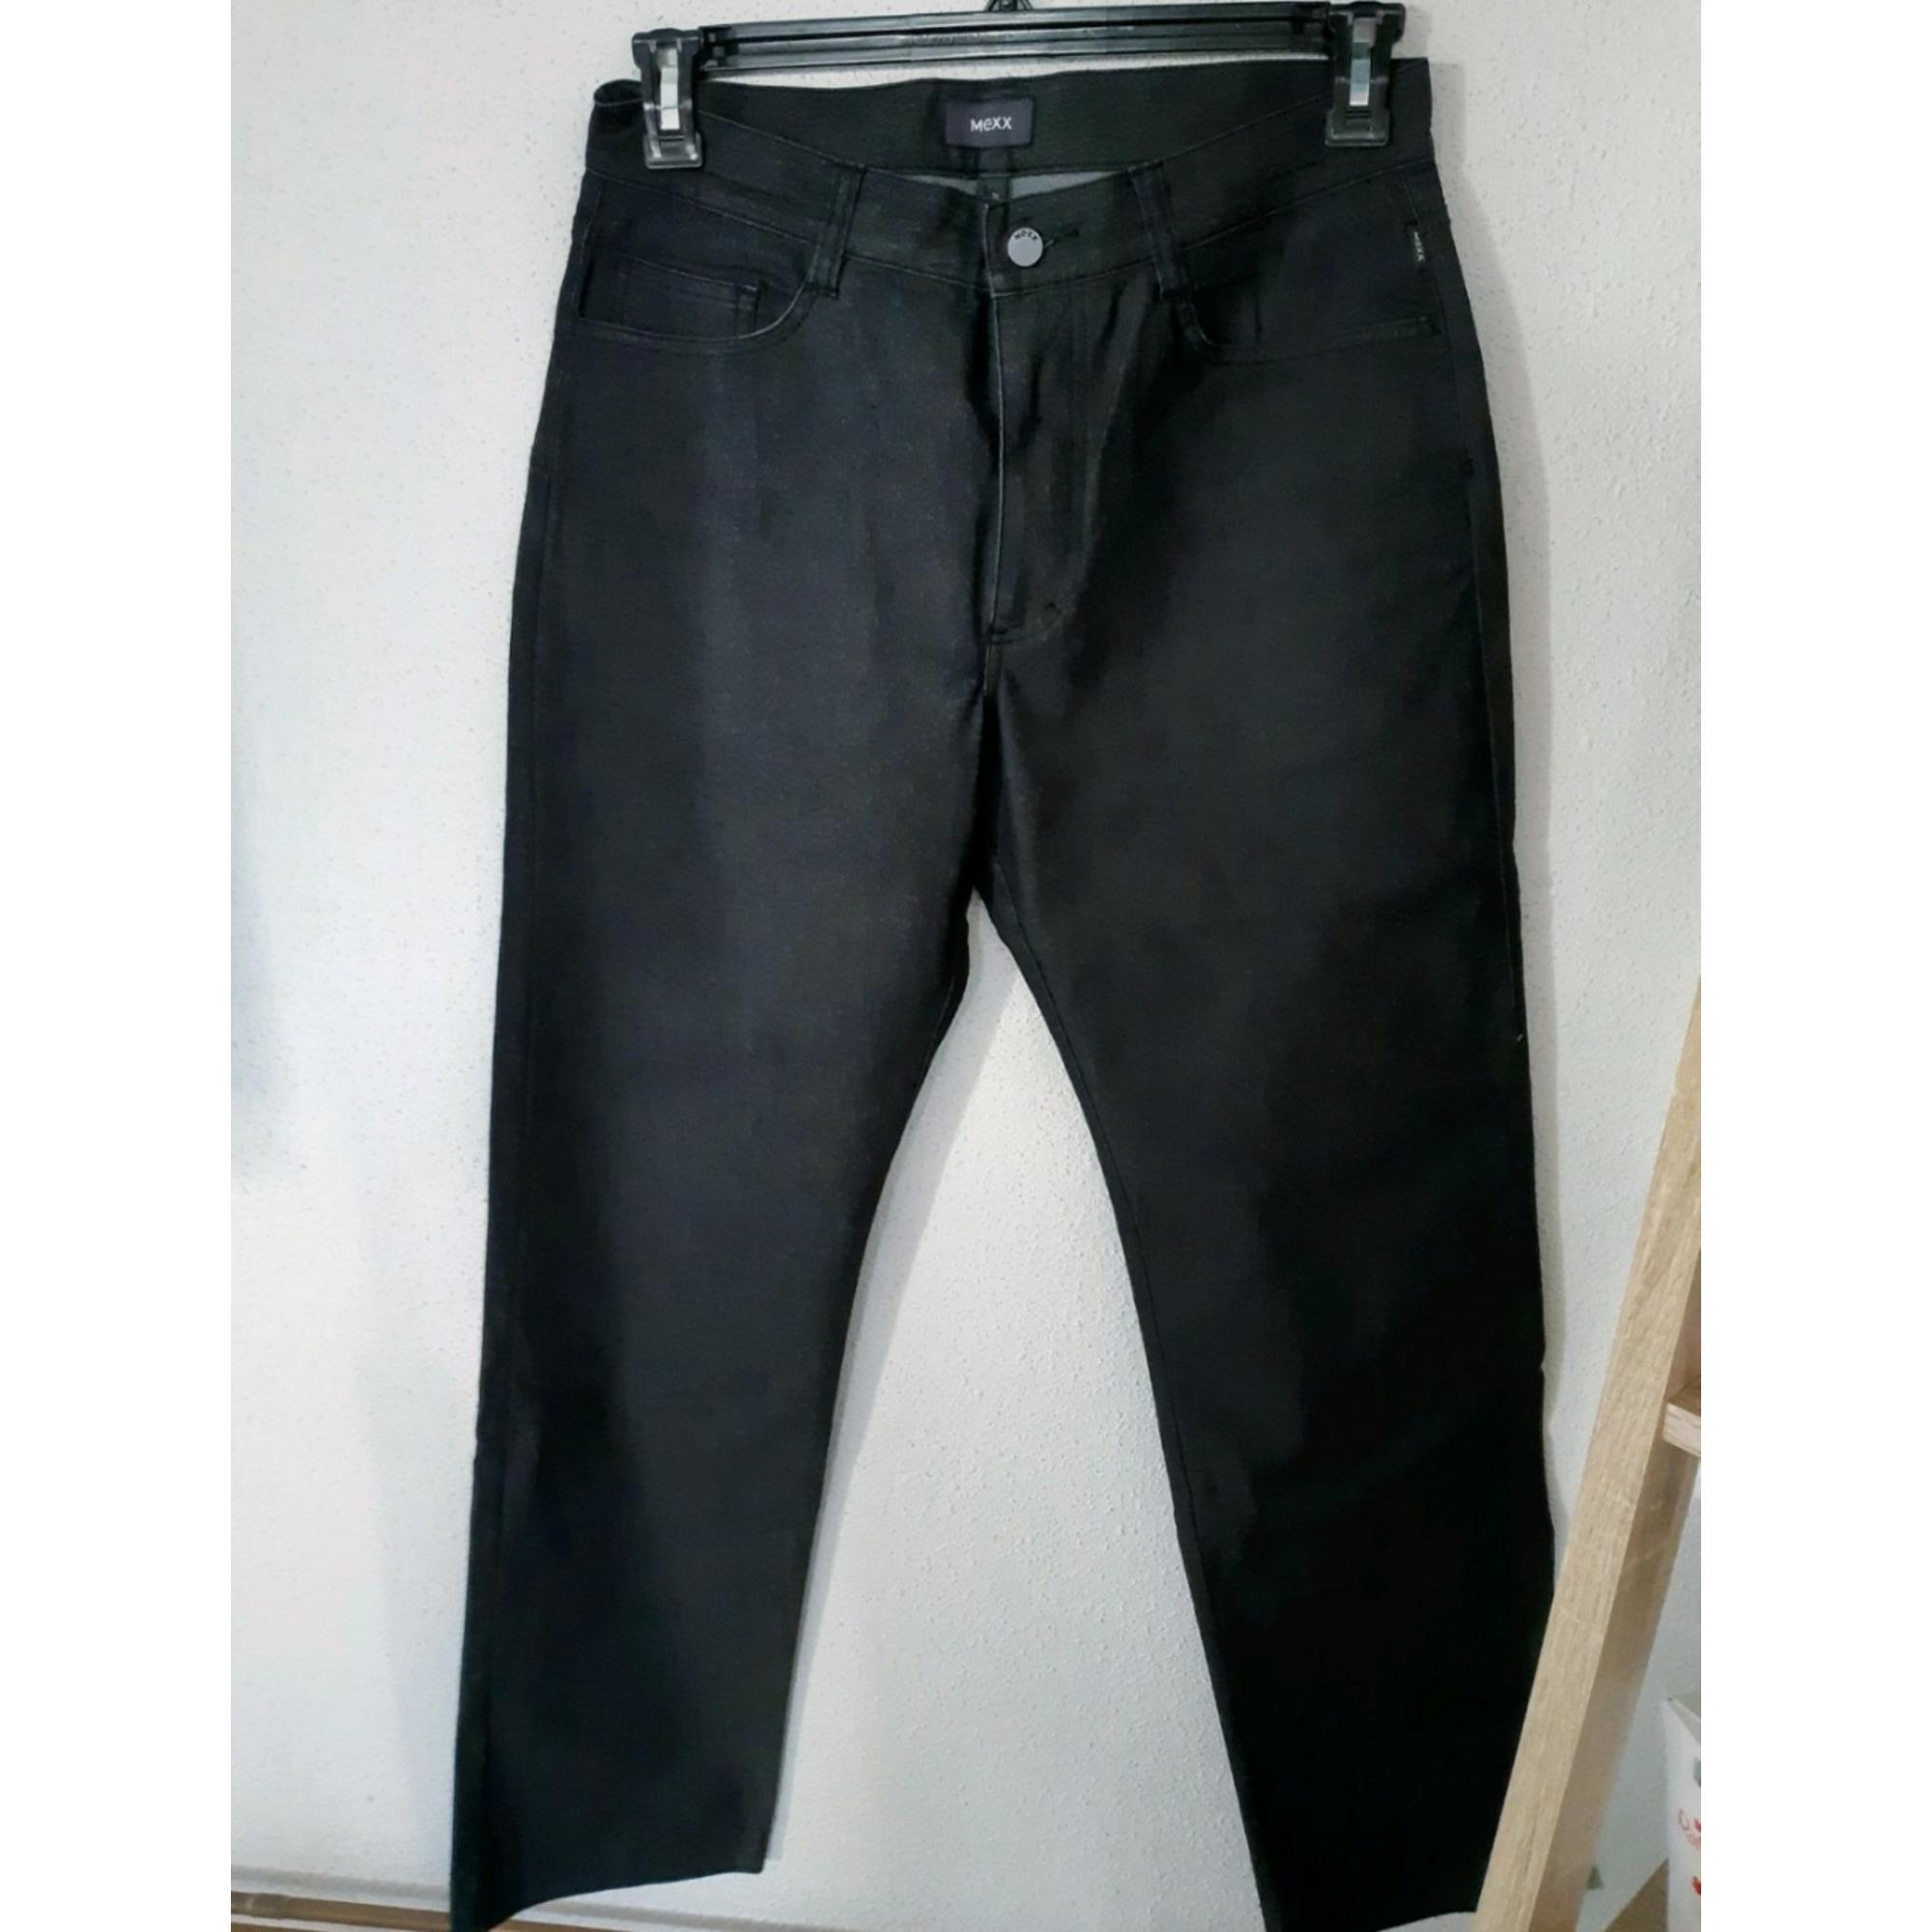 Pantalon droit MEXX Gris, anthracite